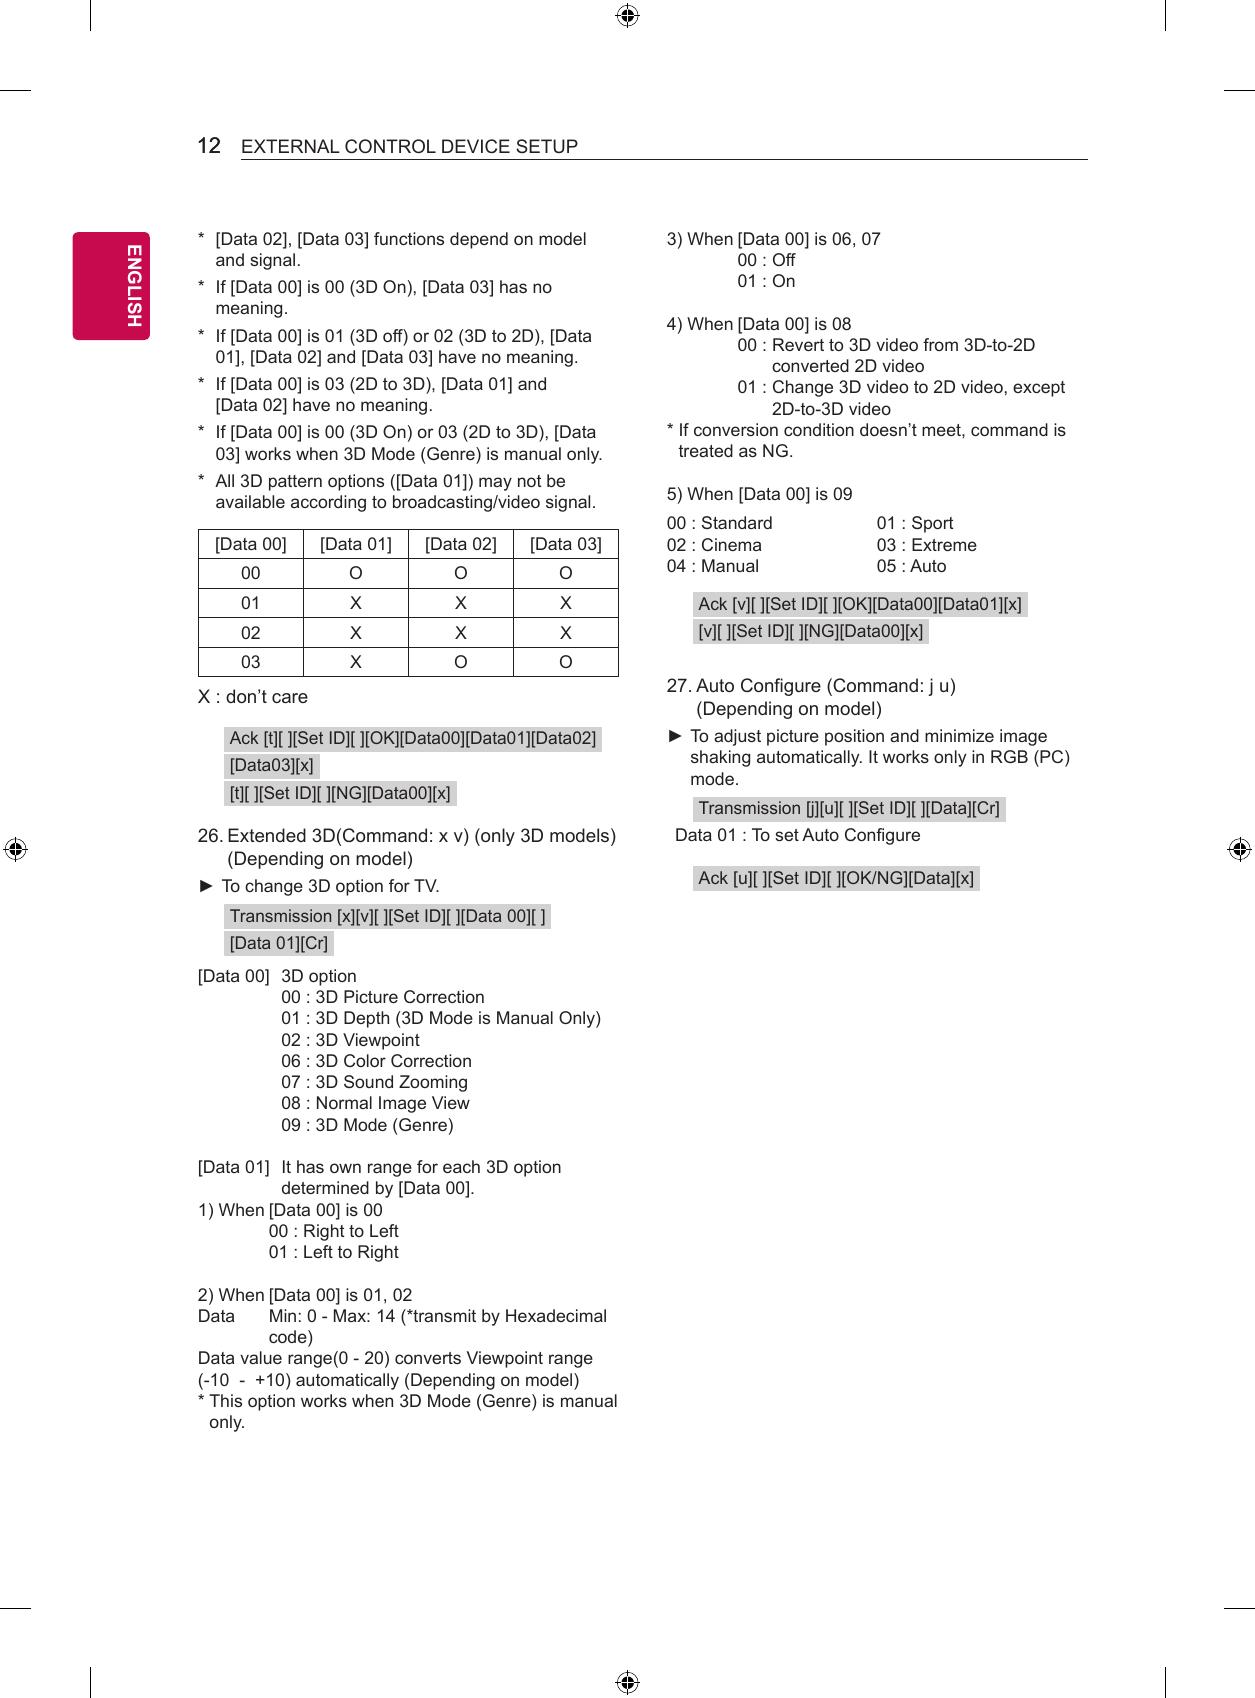 LG 65UK6300PUE User Manual Owner's MFL70340102 1 2 MFL70343402 1 0